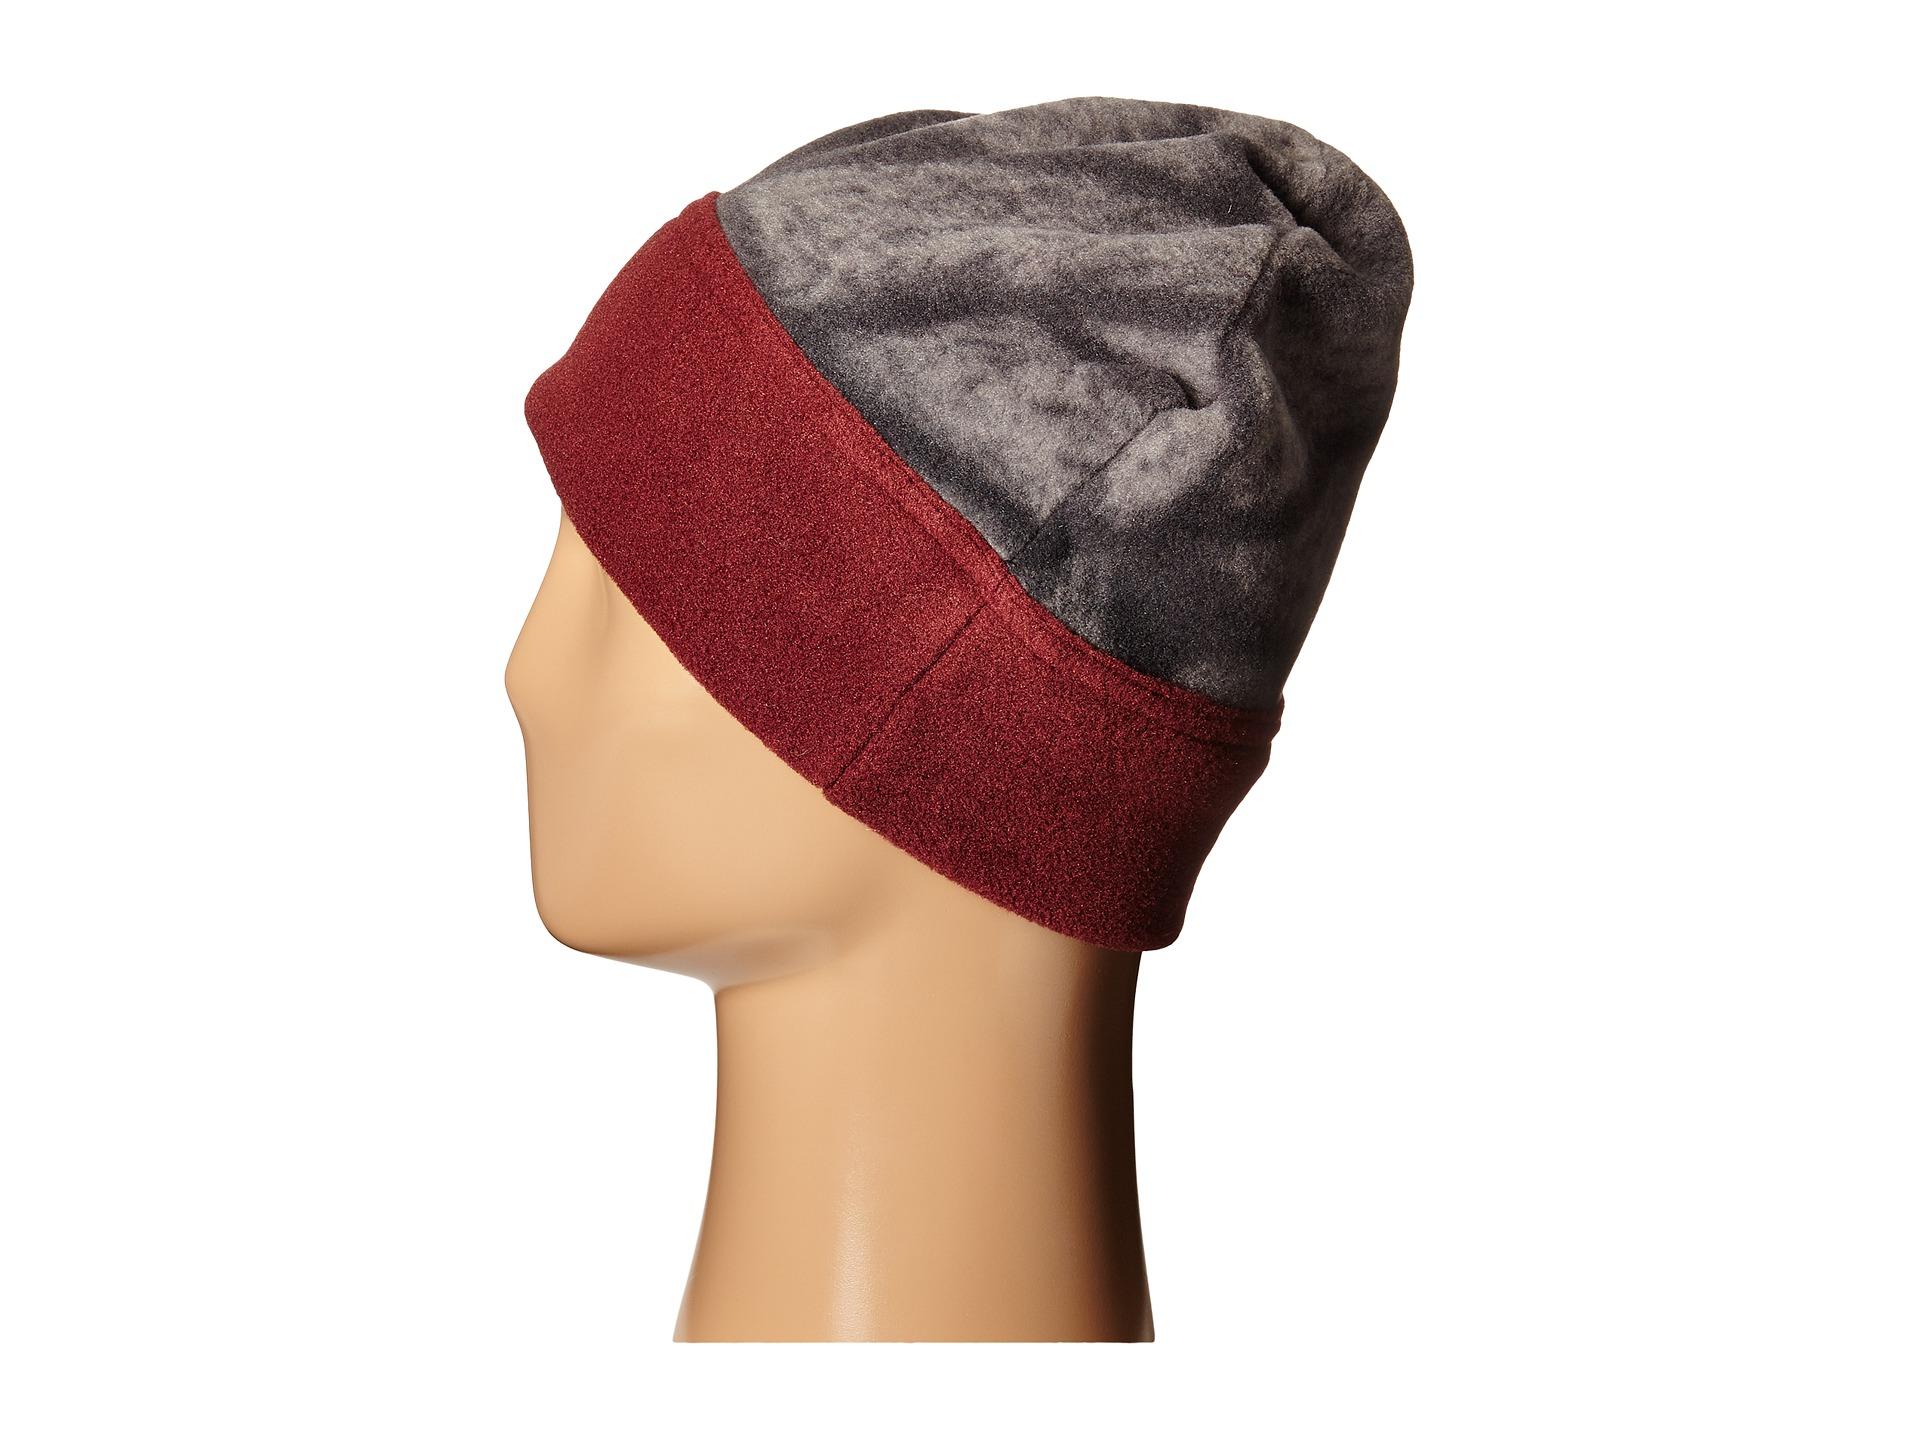 Lyst - Patagonia Synch Alpine Hat in Gray for Men 8a54cc6b4db